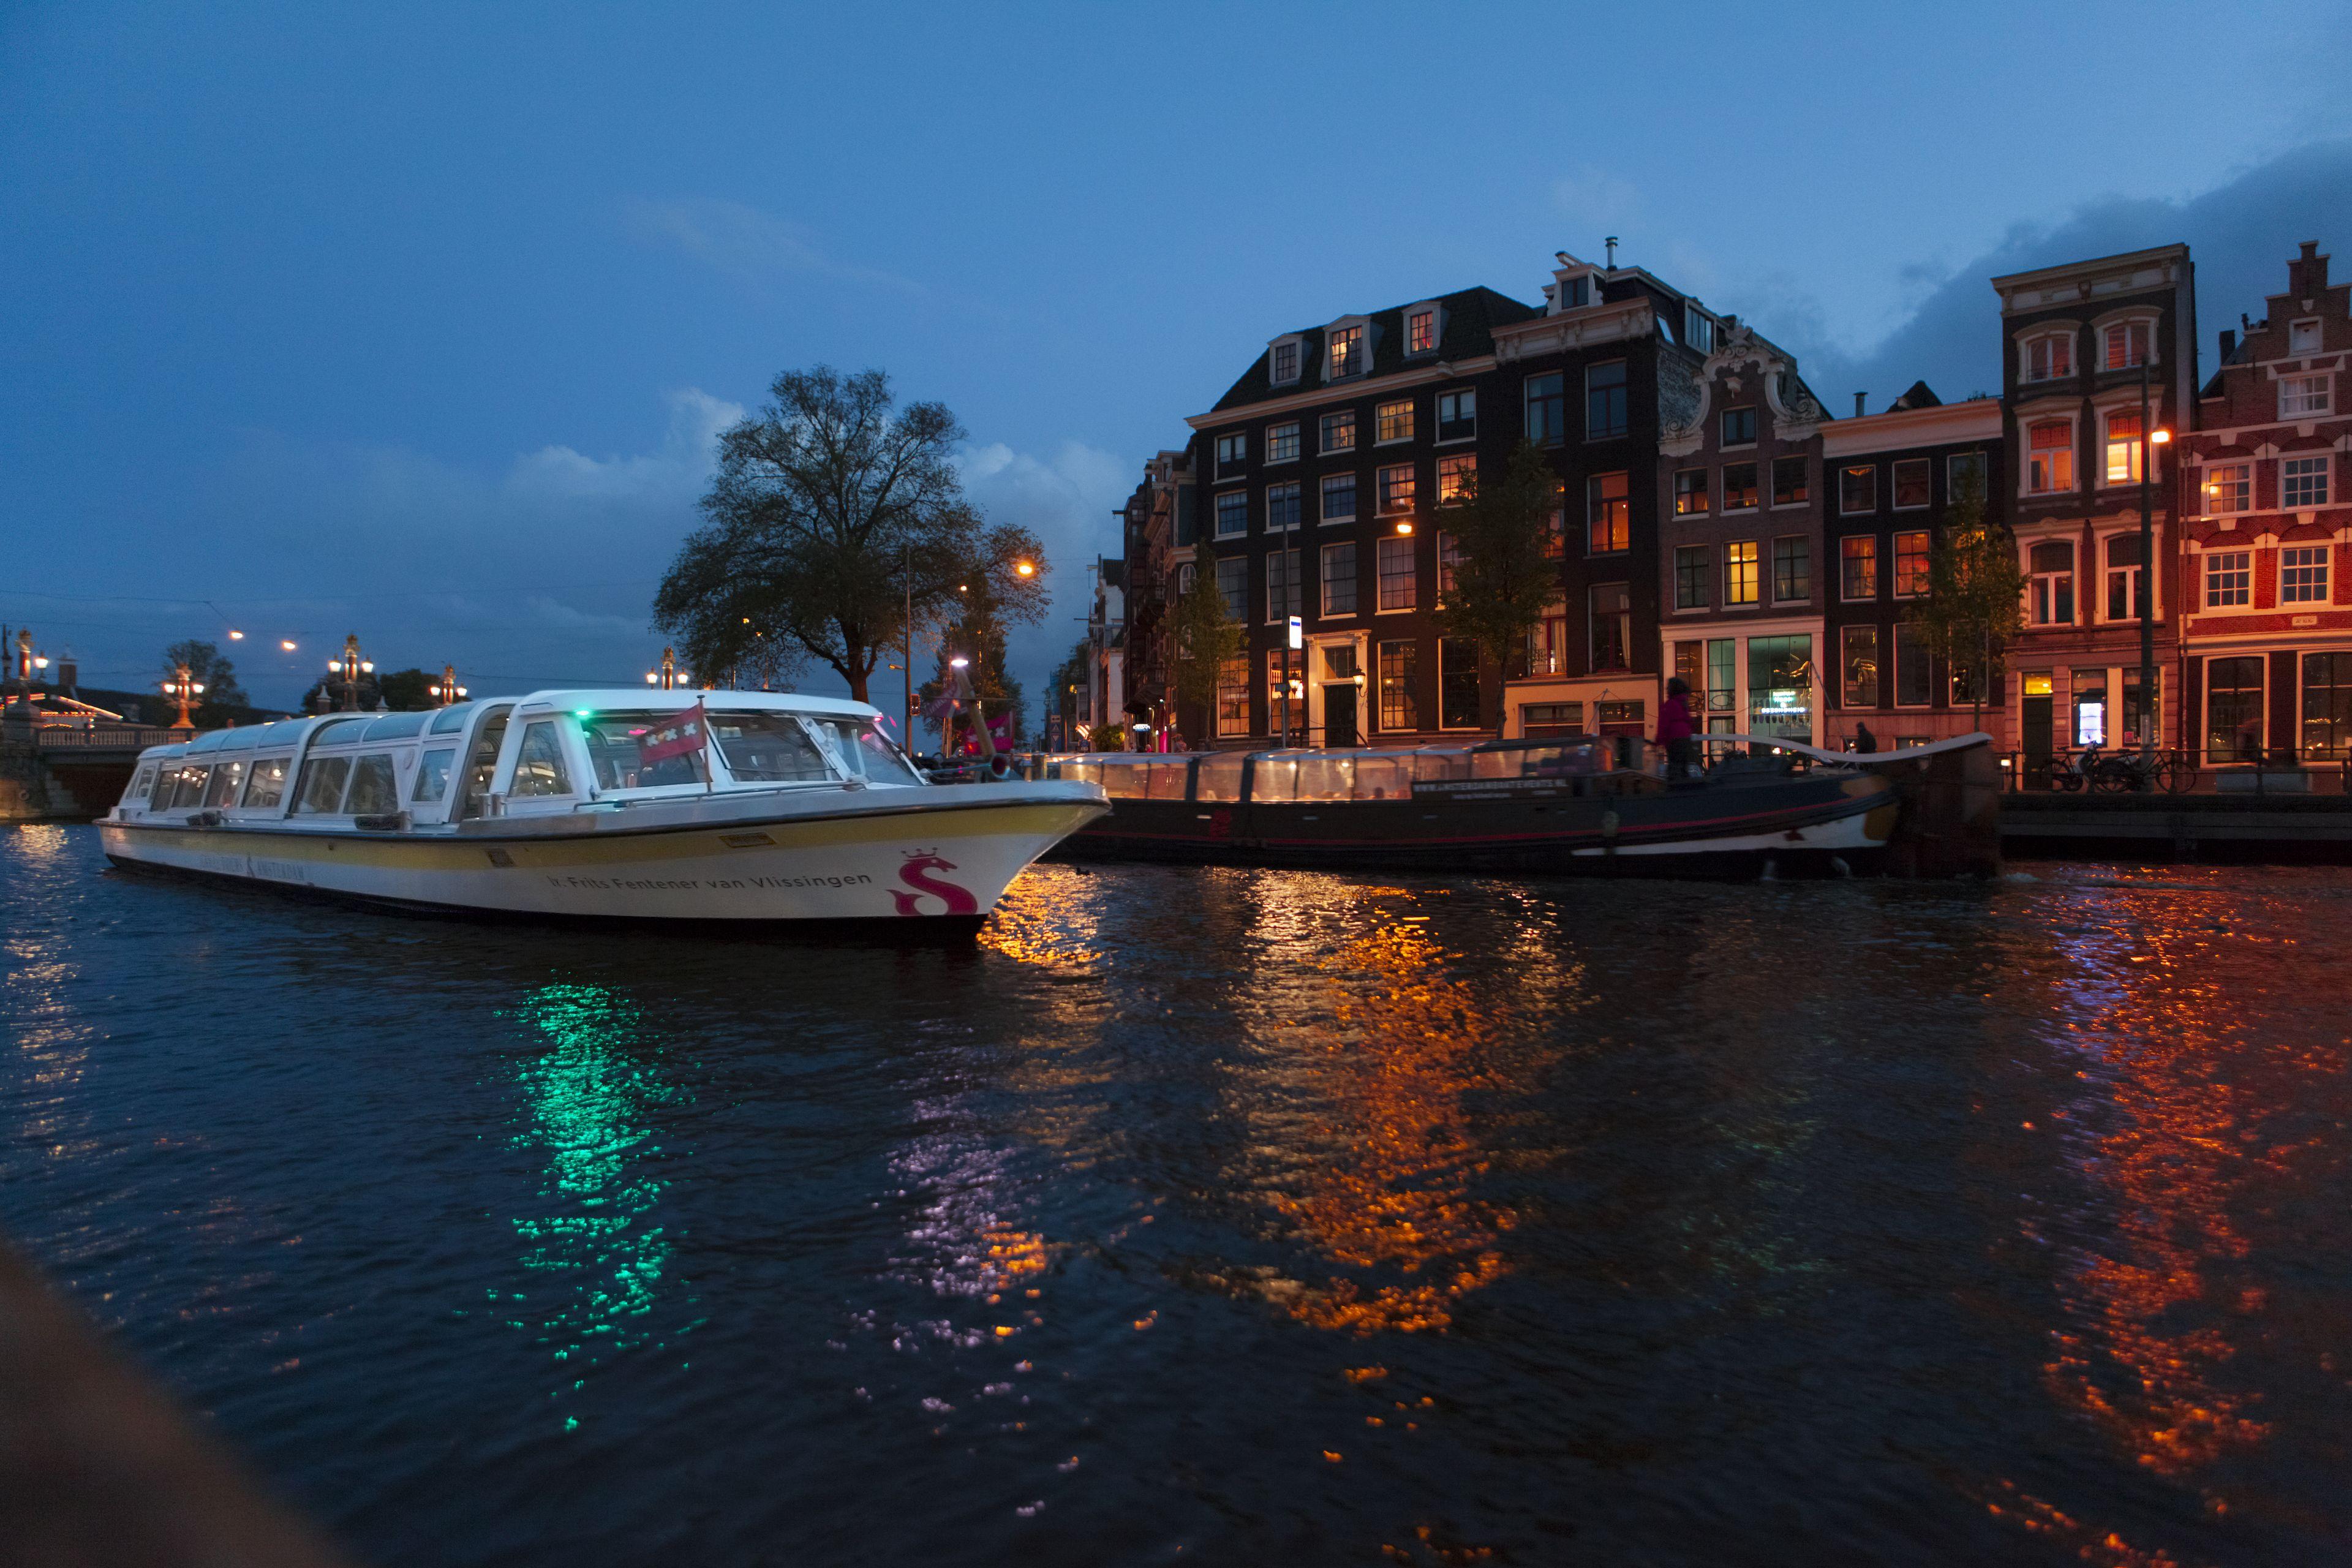 CTA Amsterdam Dinner Cruise_Canal cruise by night.jpg